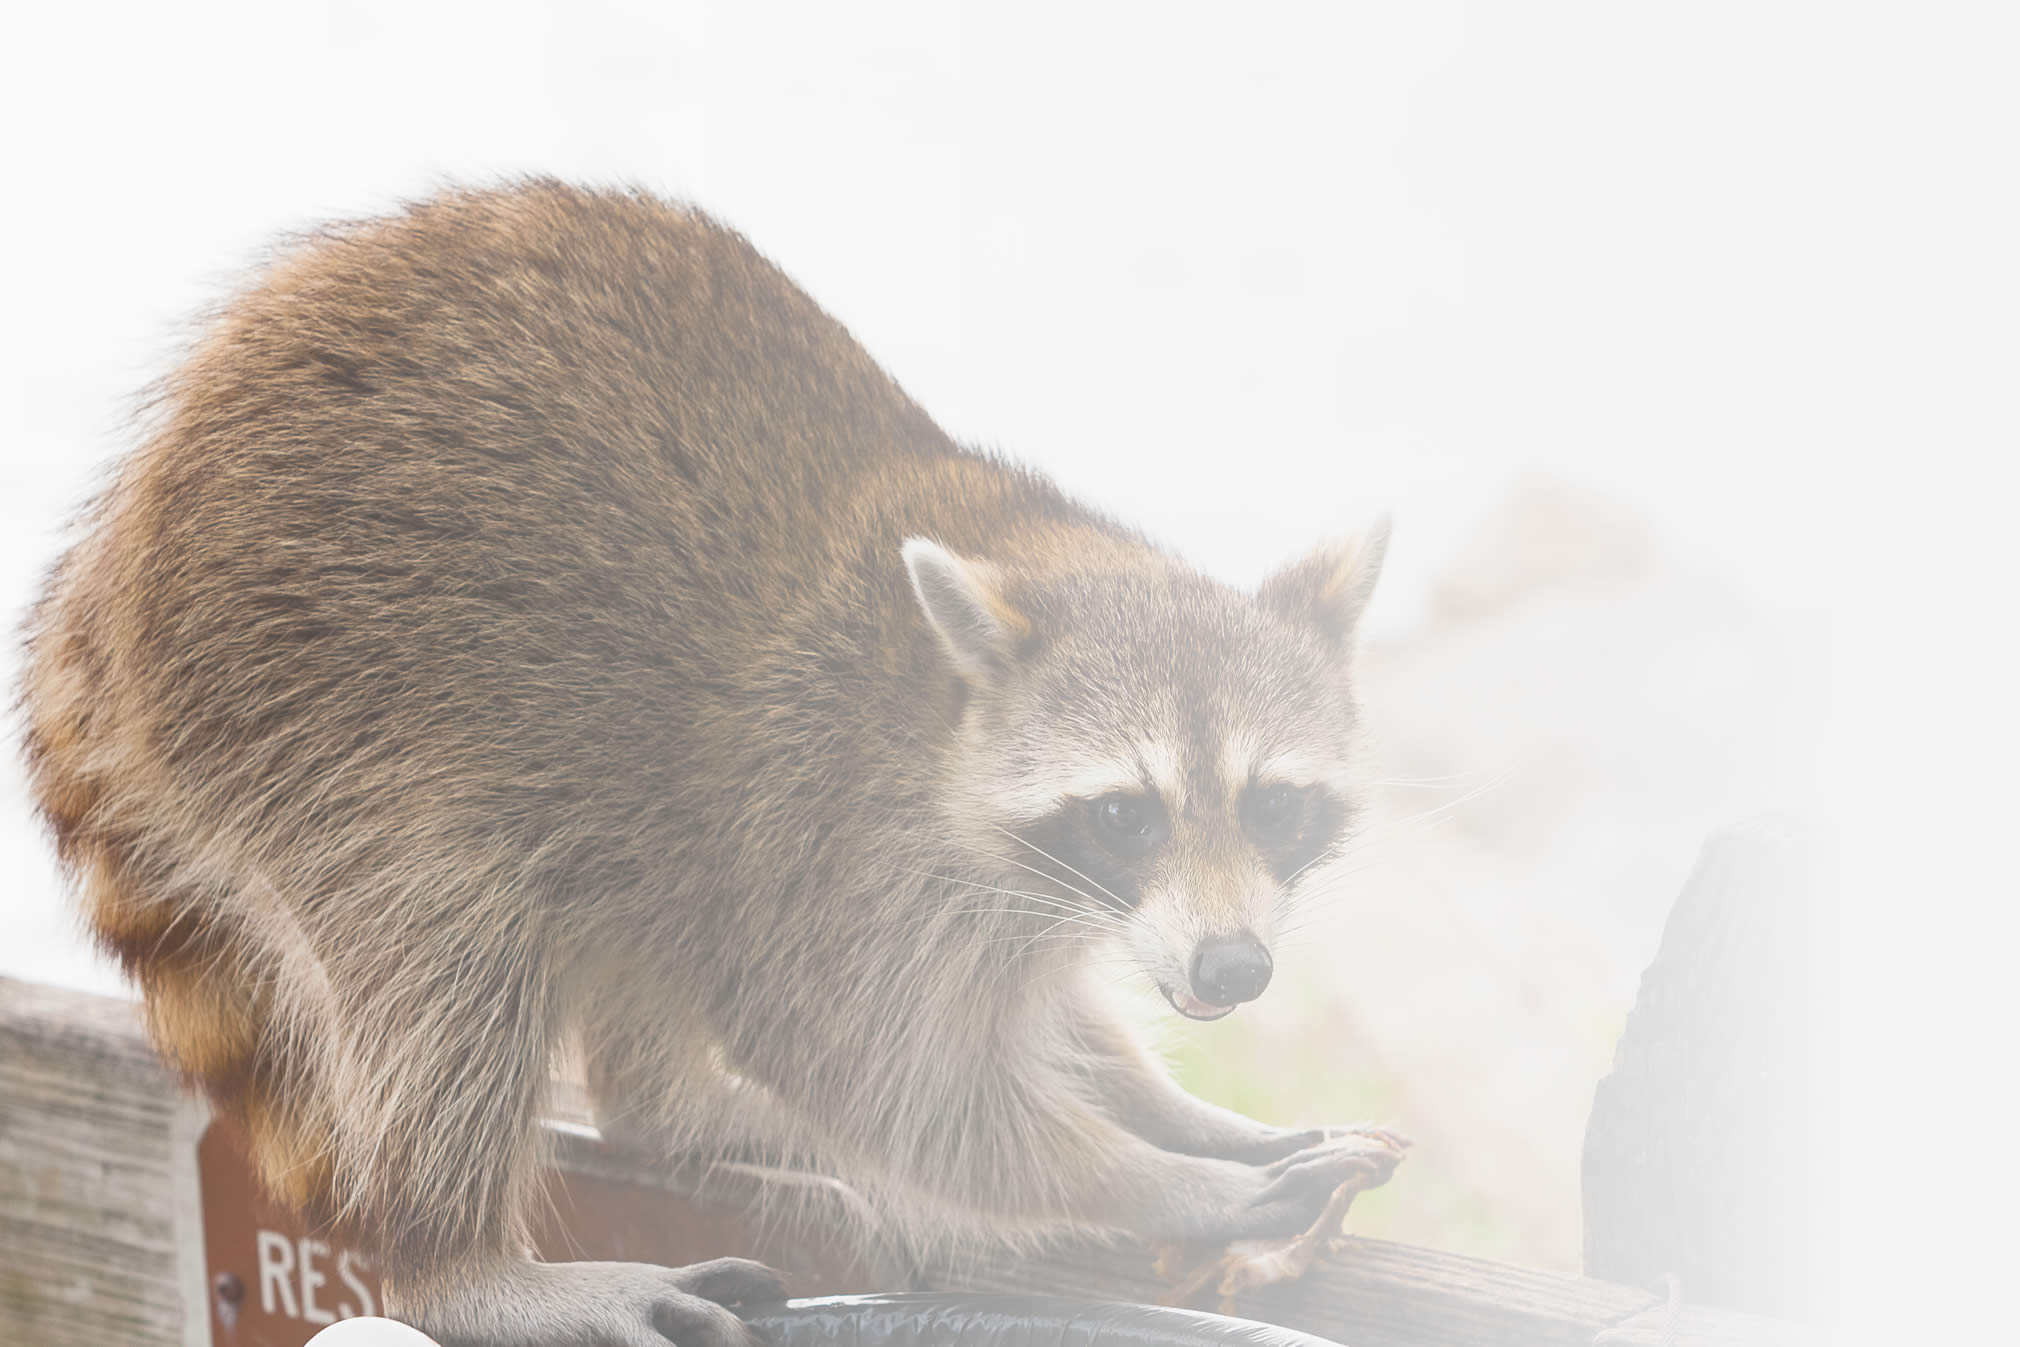 Raccoon on a tree branch